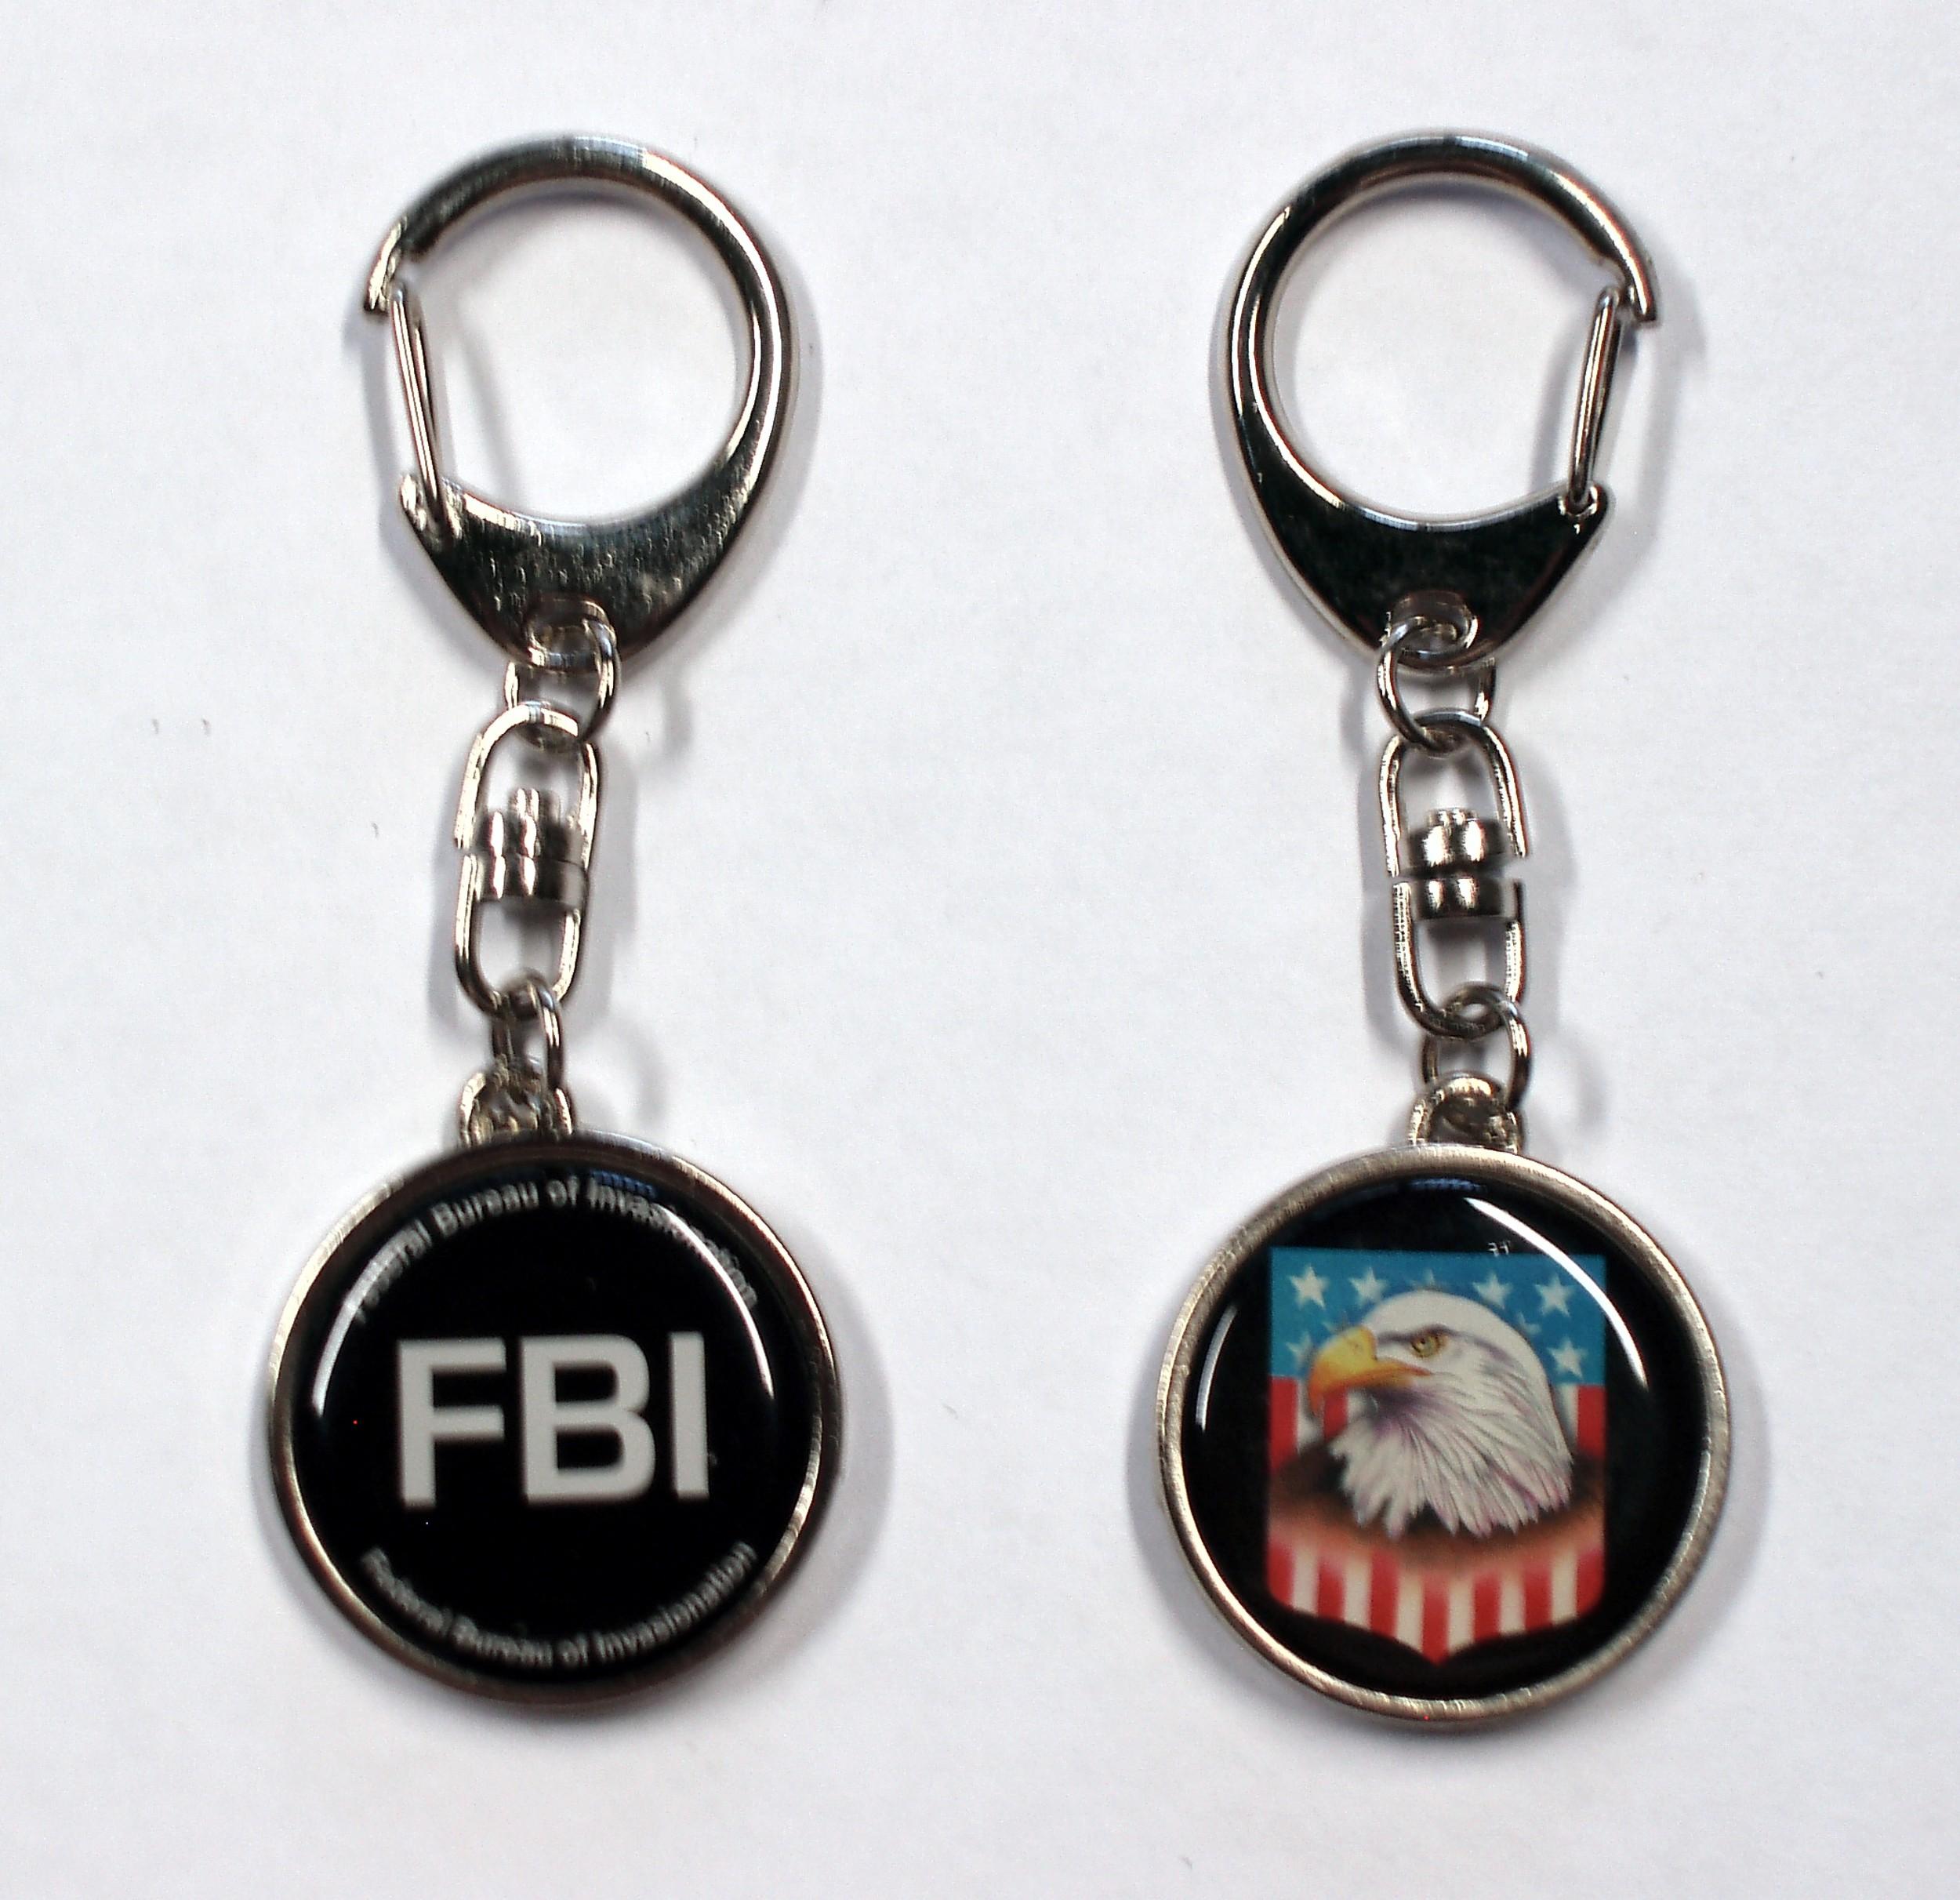 Schlüsselanhänger Metall FBI/Adler 95 x 35 mm je 1 Motiv pro Seite – Bild 1